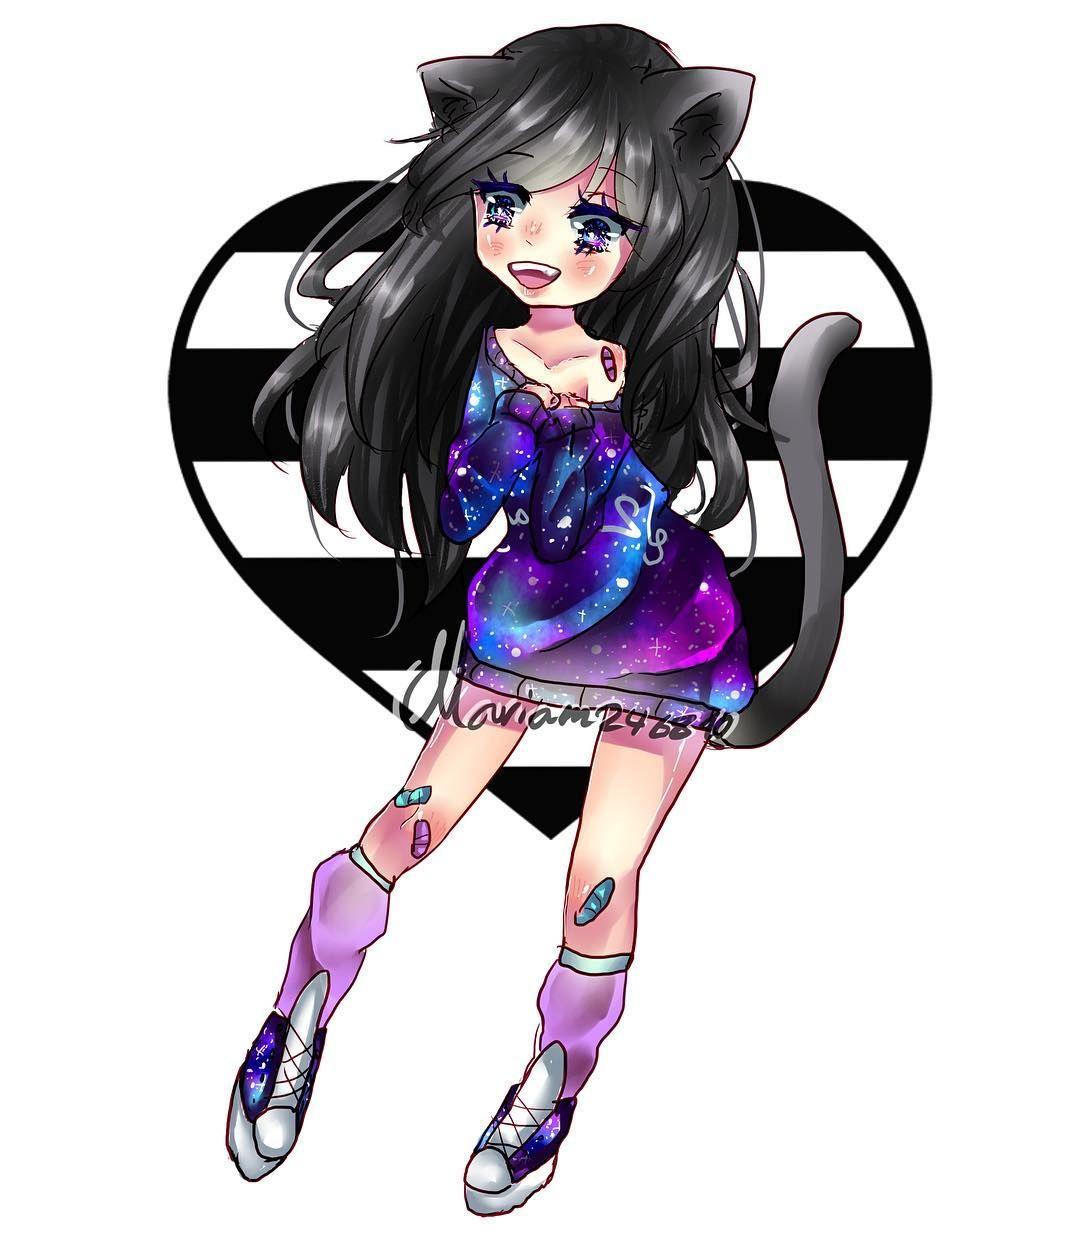 من زمان عن رسم الفضاء على الملابس Aillis Anime Draw Drawing Like4like Paint Painting Follow Painter Kawaiia Instagram Posts Instagram Anime